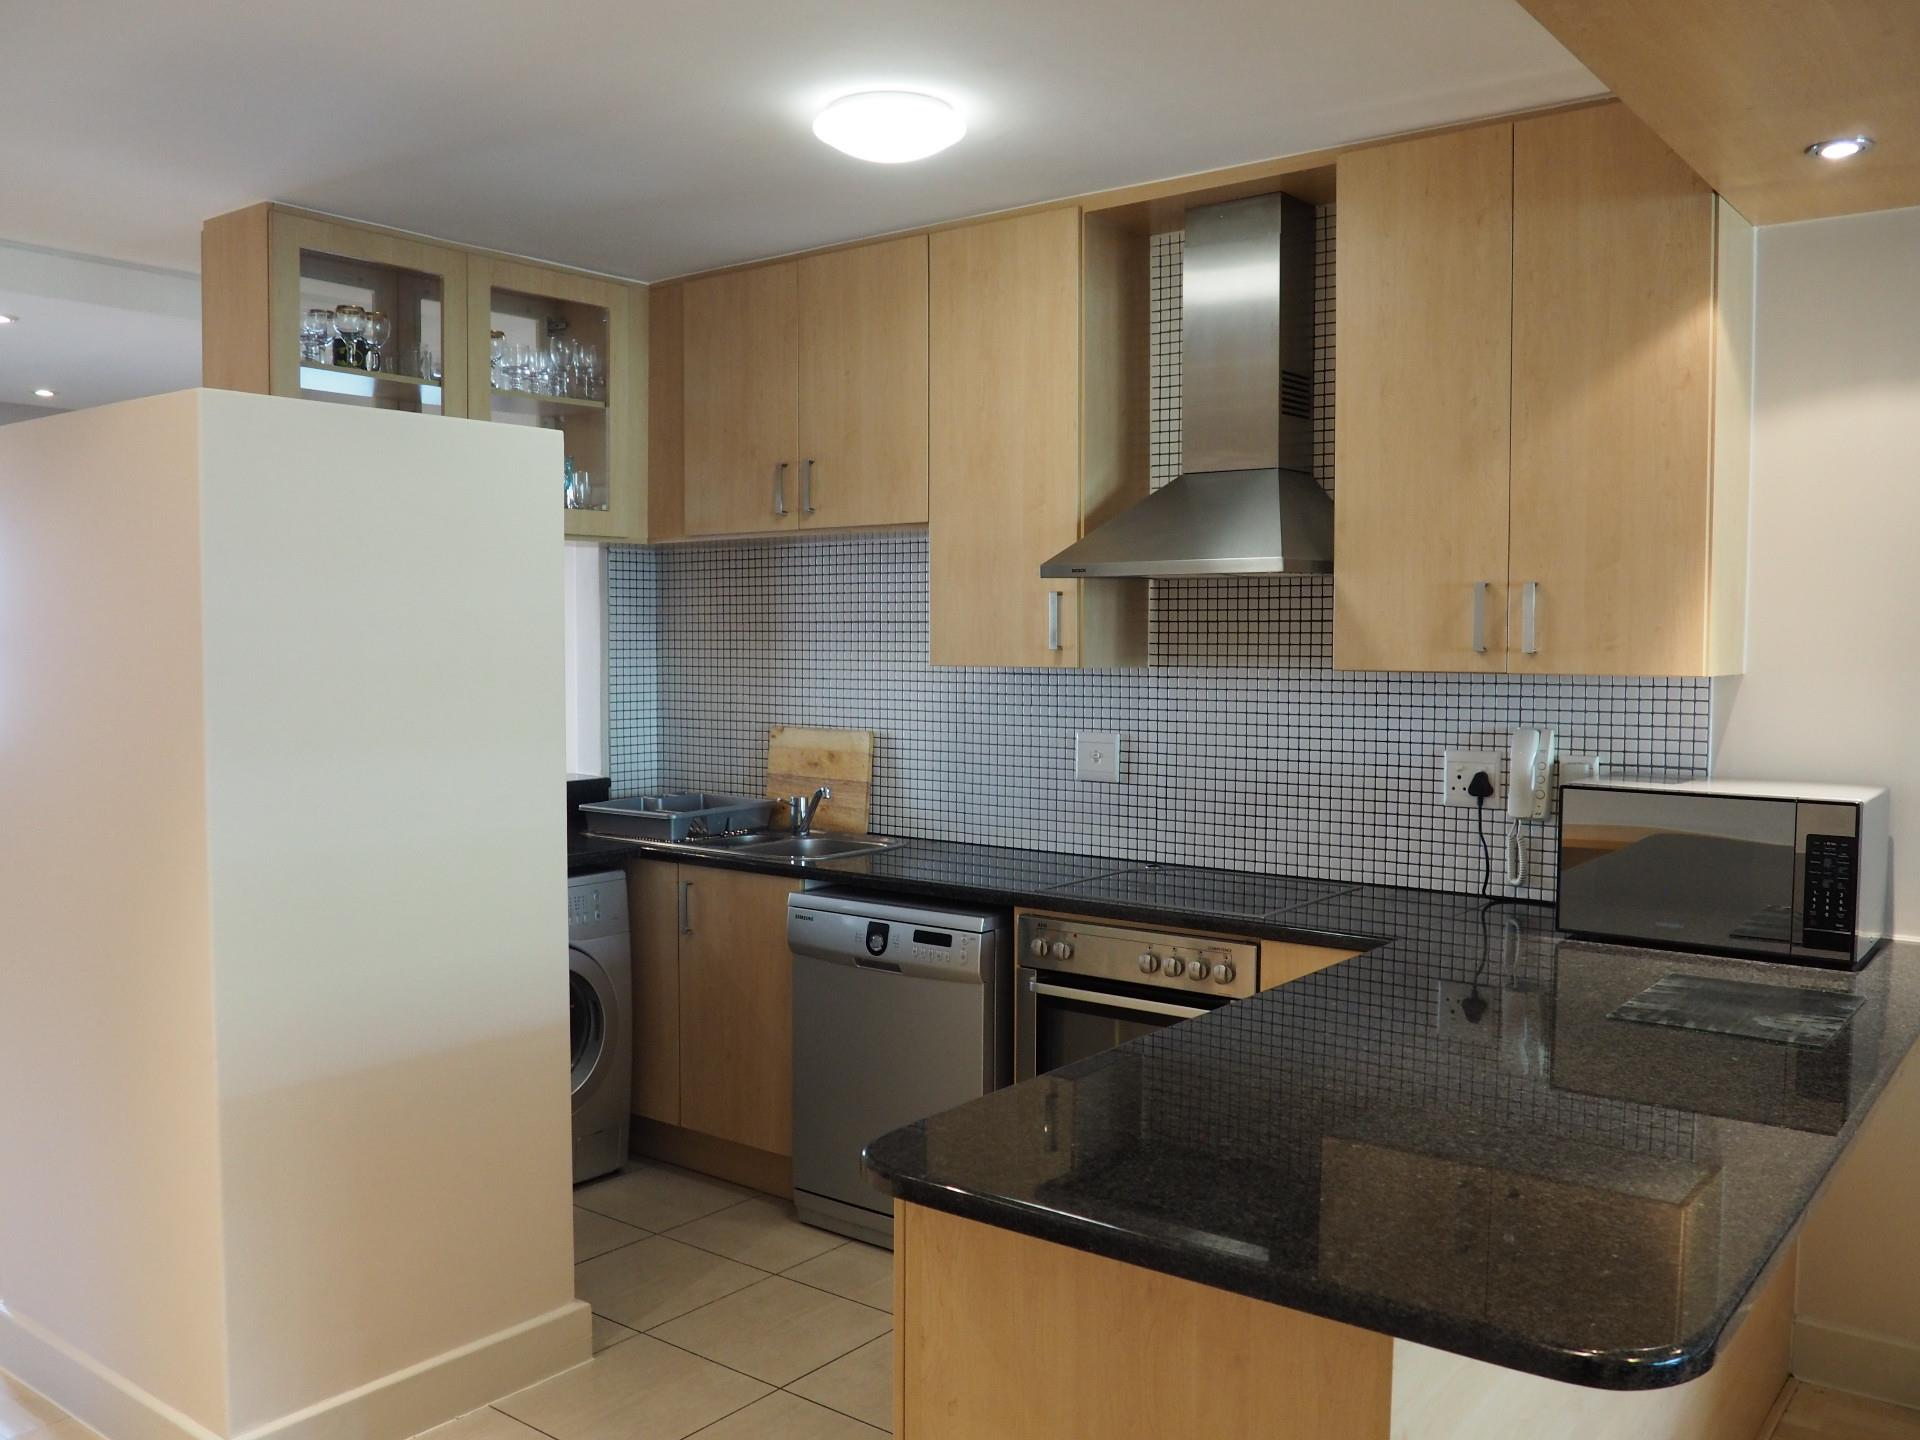 1 Bedroom Apartment For Sale in Sandown